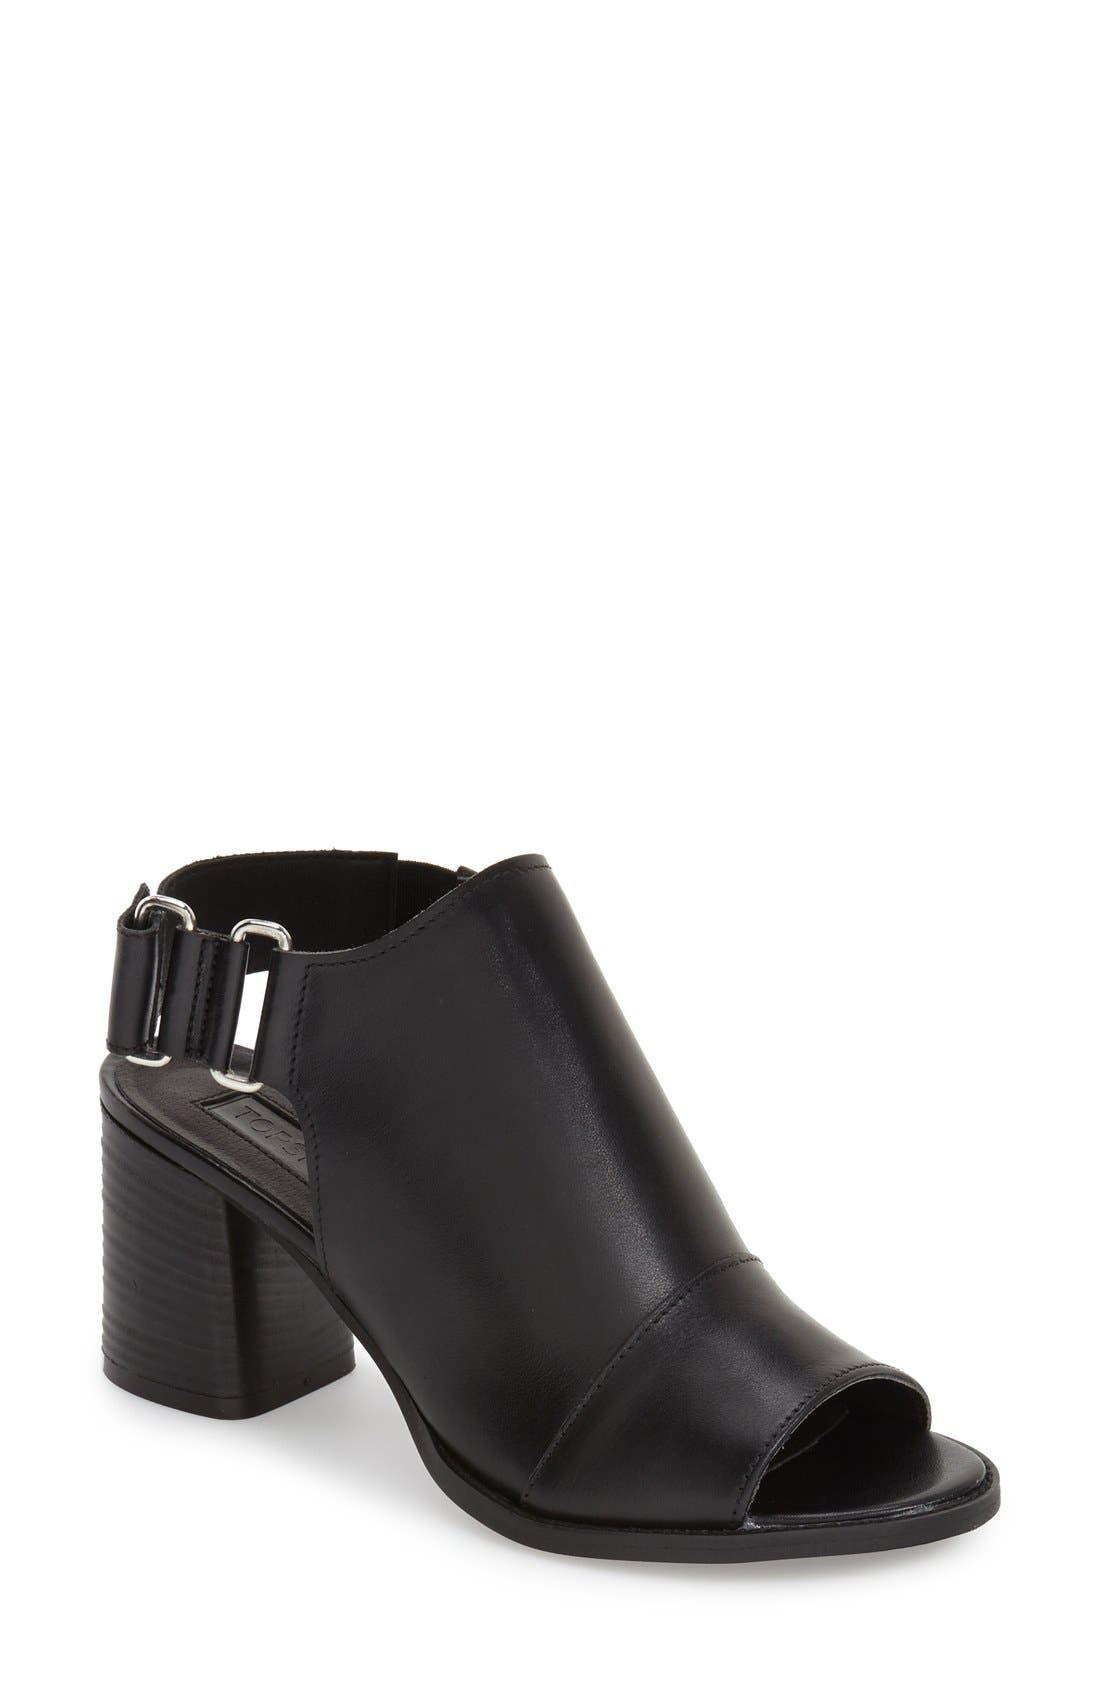 'Nimi' Slingback Round Heel Sandal, Main, color, 001